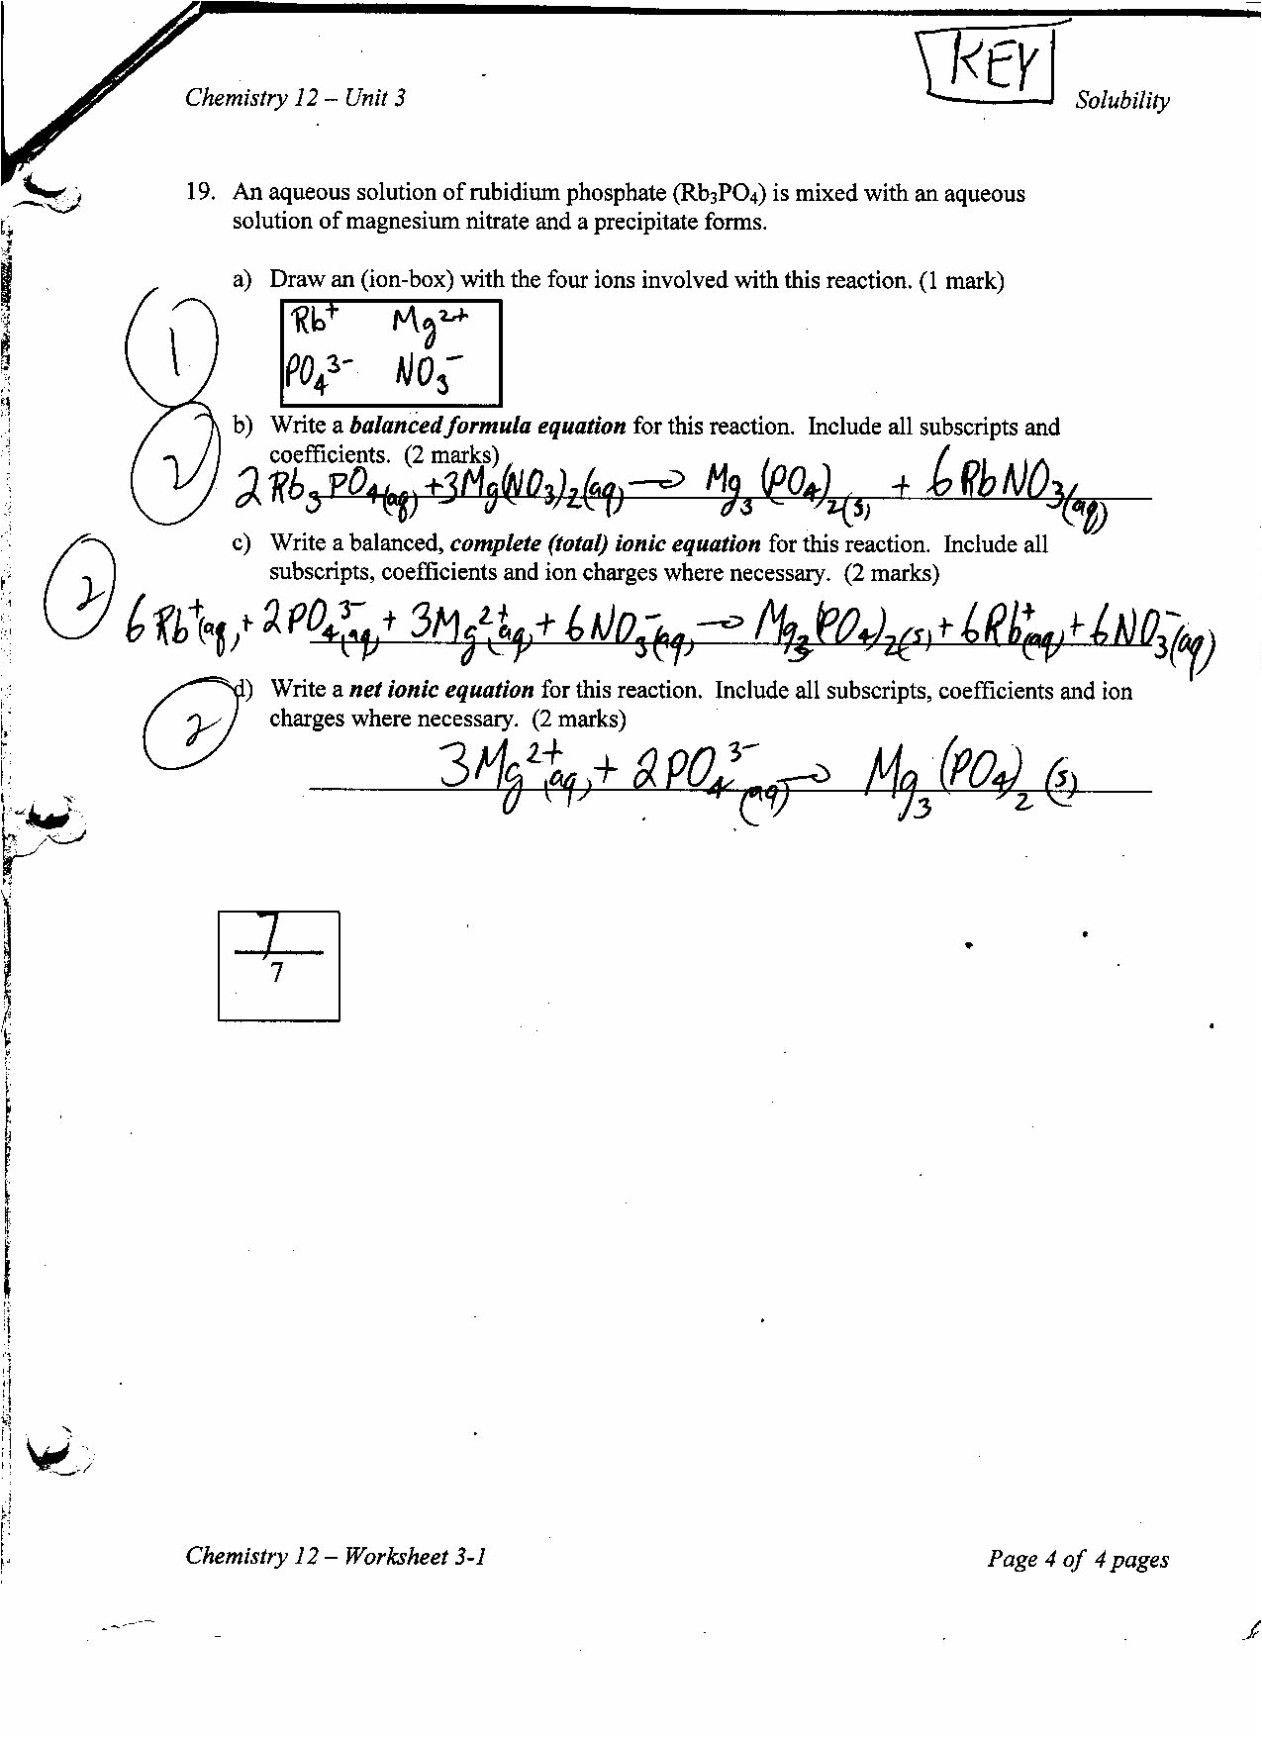 Chemistry Unit 6 Worksheet 1 Answer Key